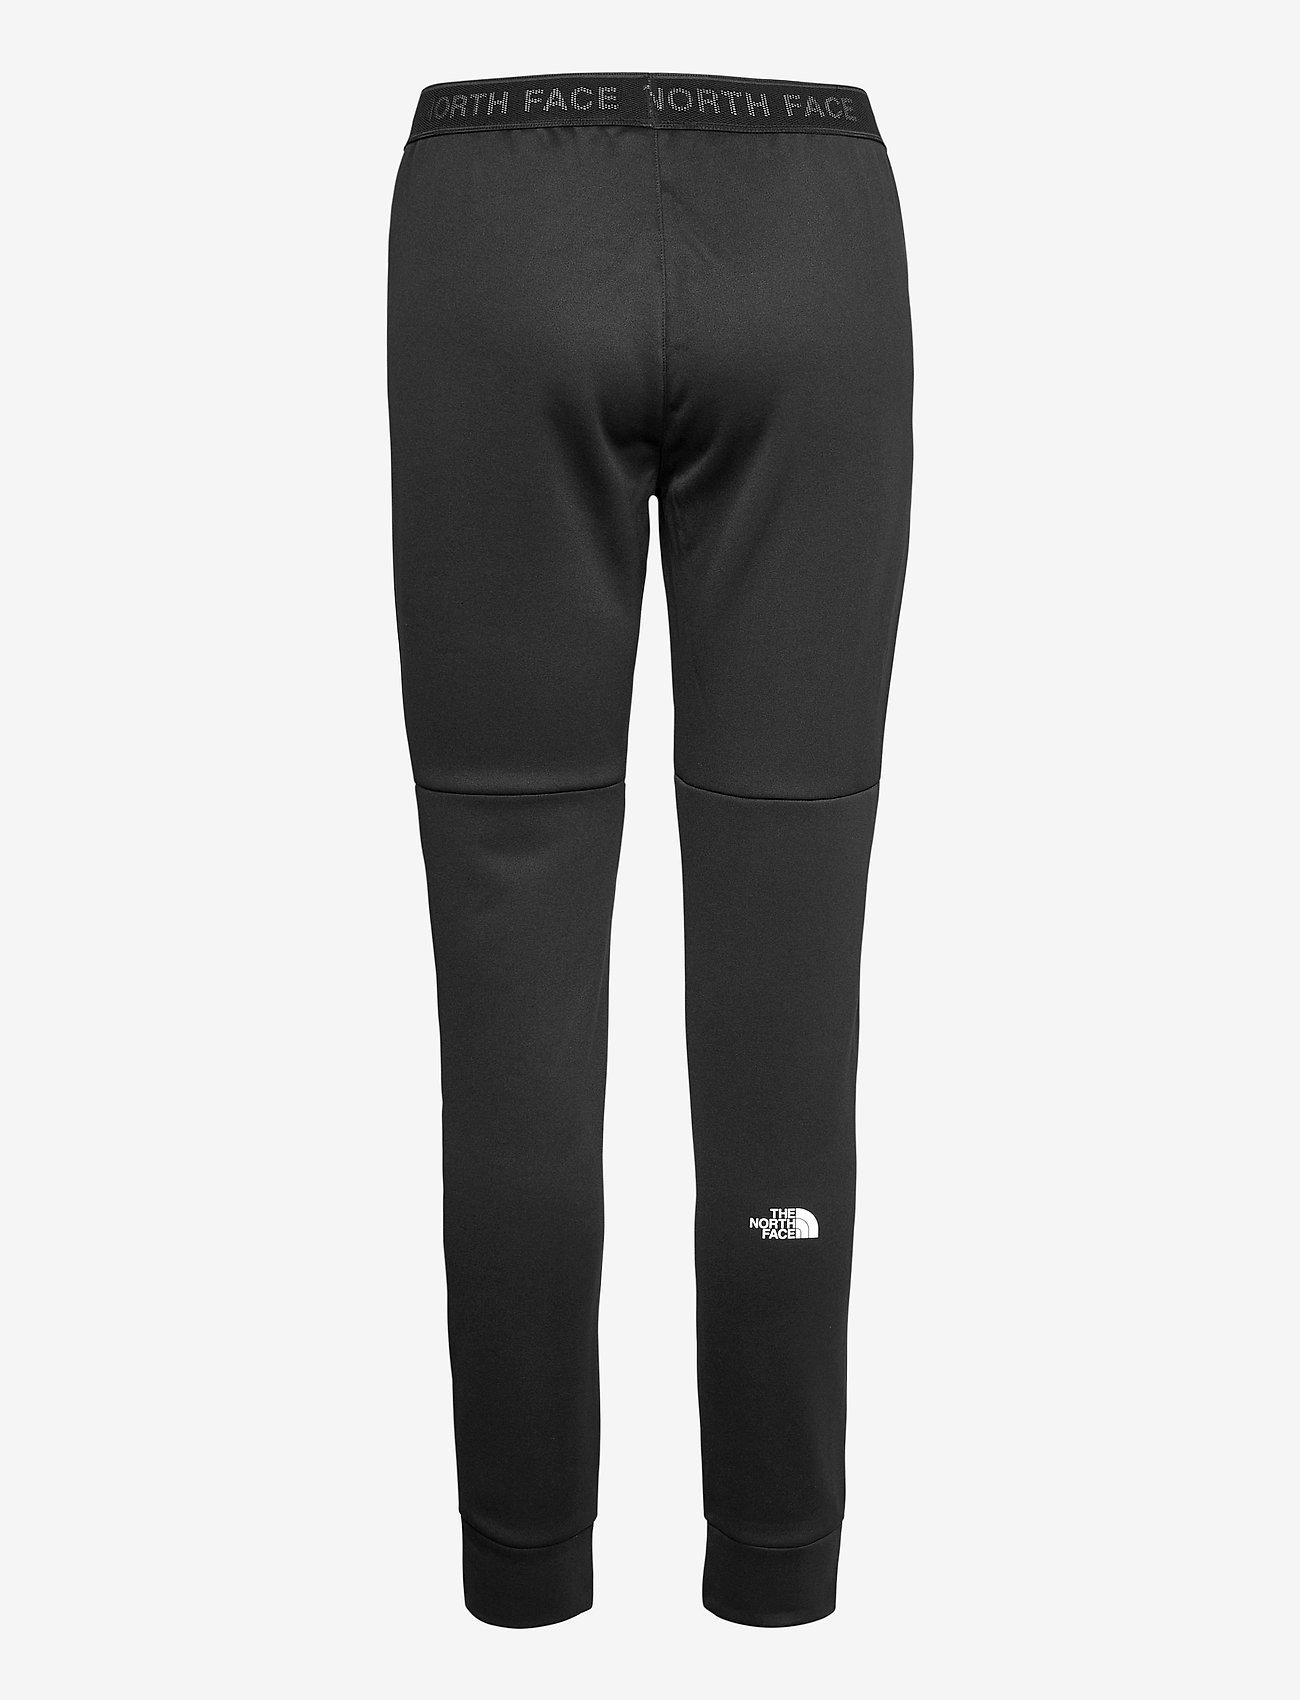 The North Face - W TNL PANT - pantalon de randonnée - tnf black - 1